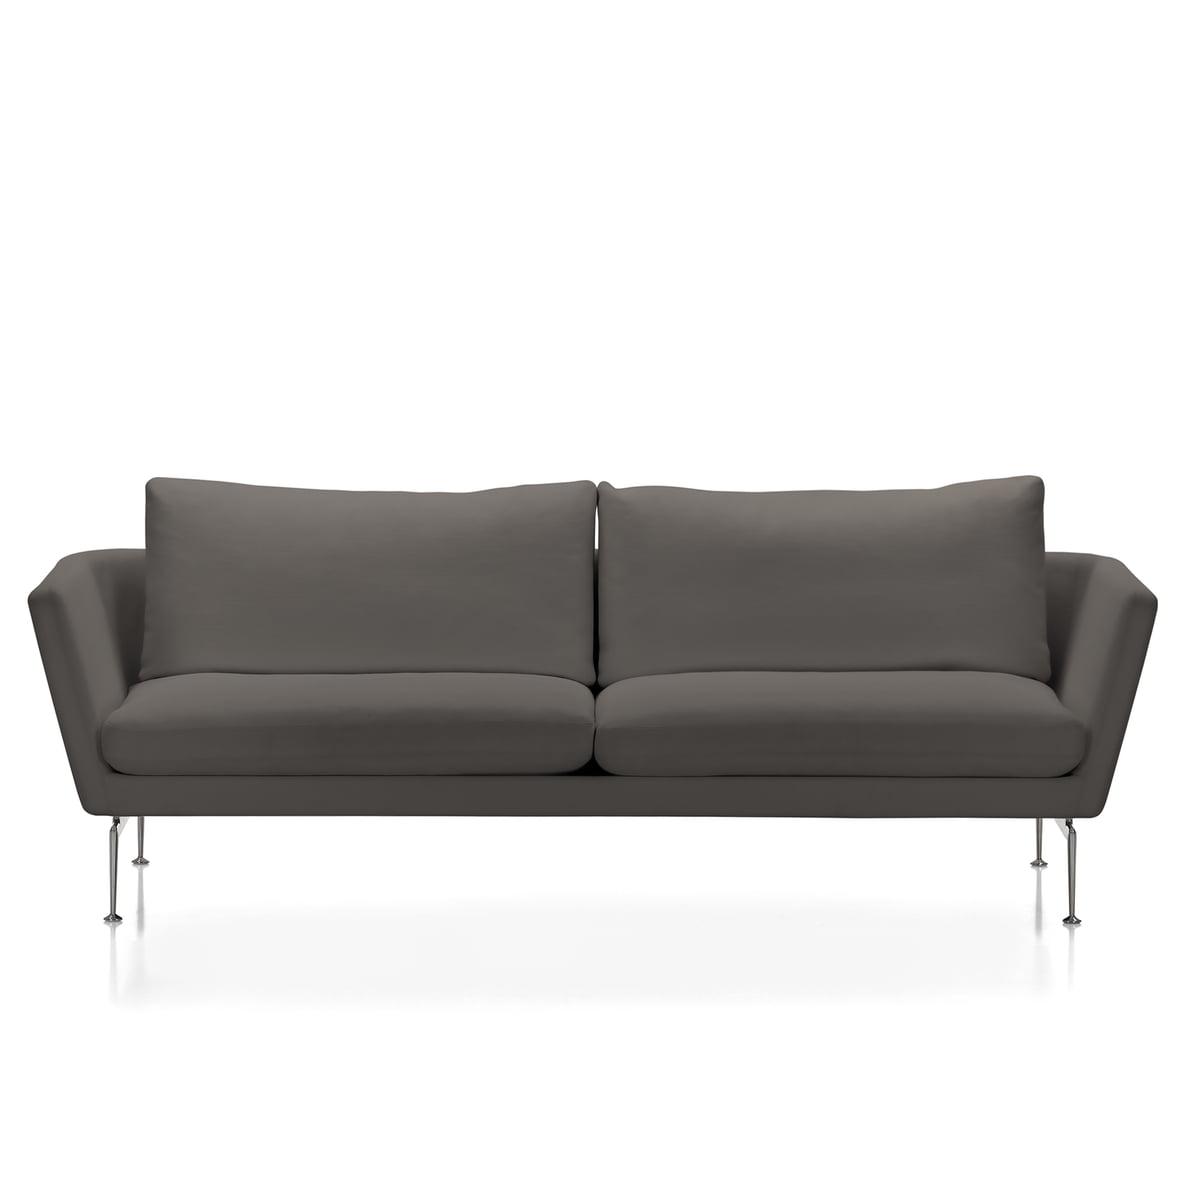 suita sofa von vitra connox. Black Bedroom Furniture Sets. Home Design Ideas